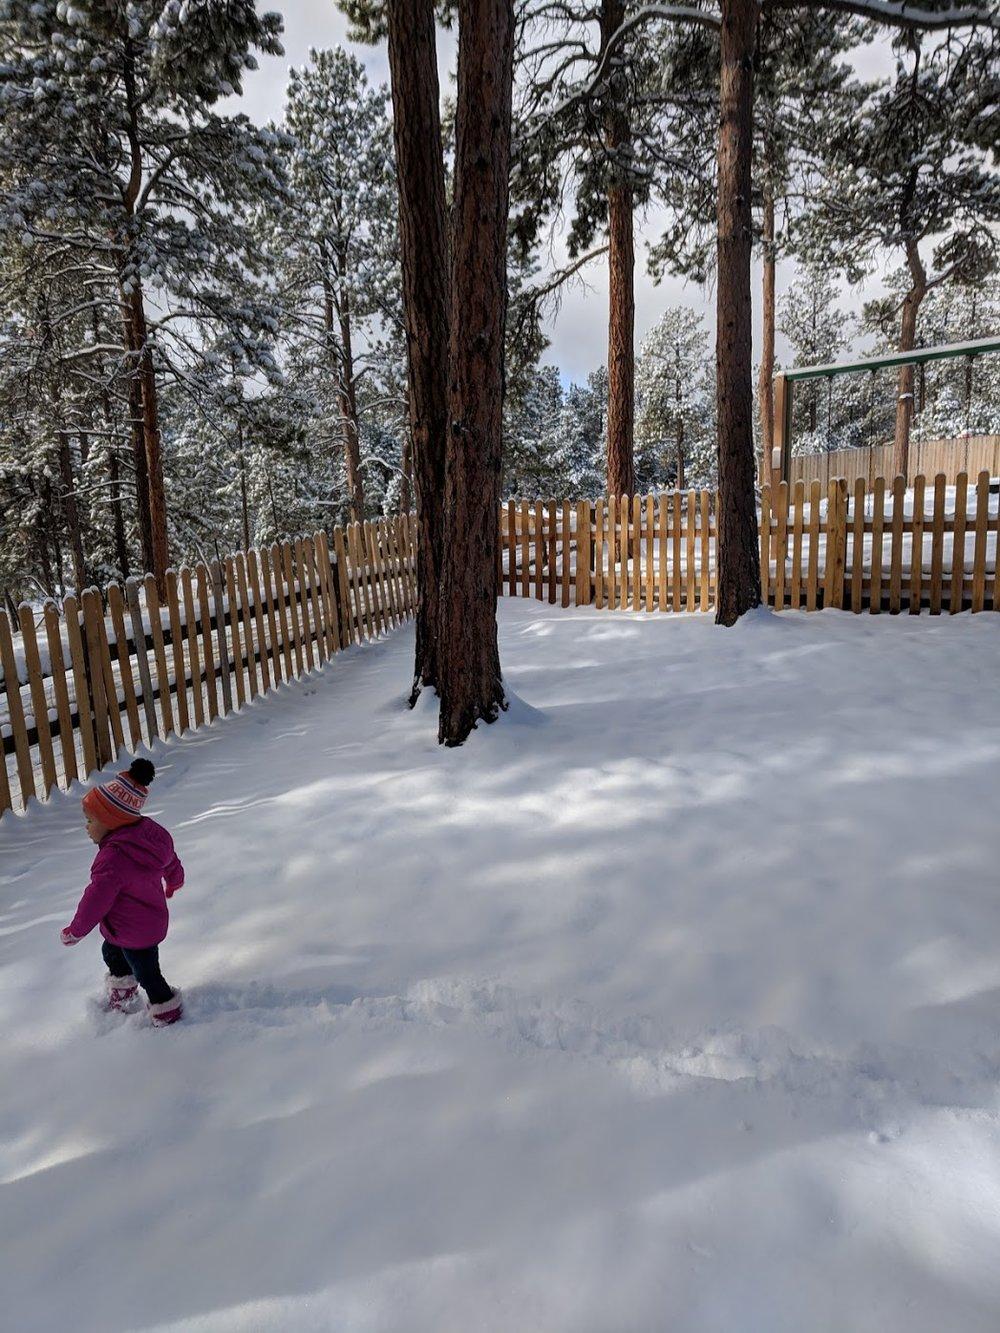 Freedom of Movement The Montessori School of Evergreen 2018